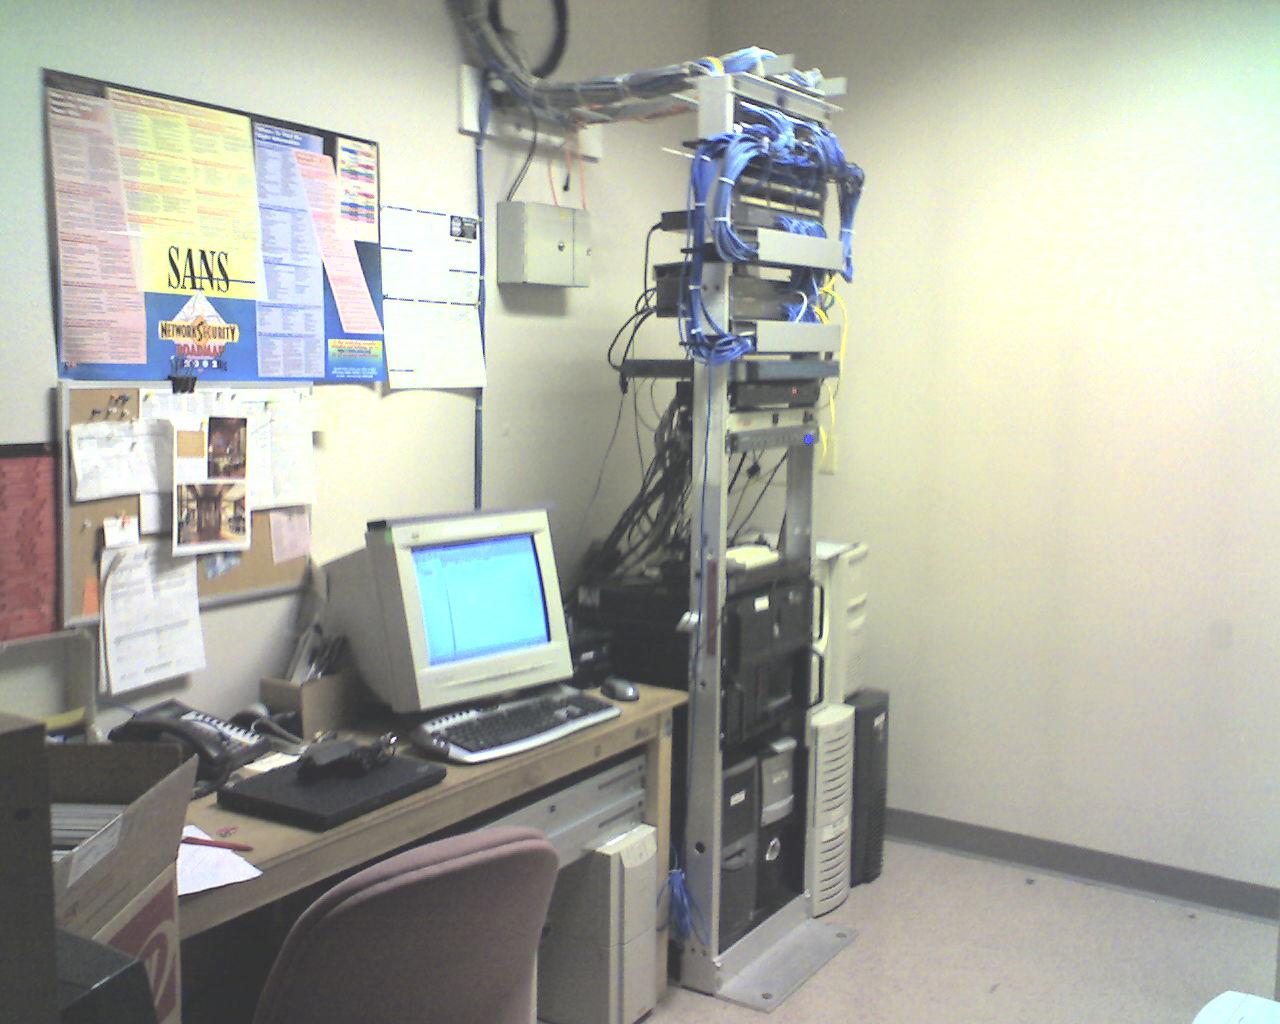 2007 server room (before us)